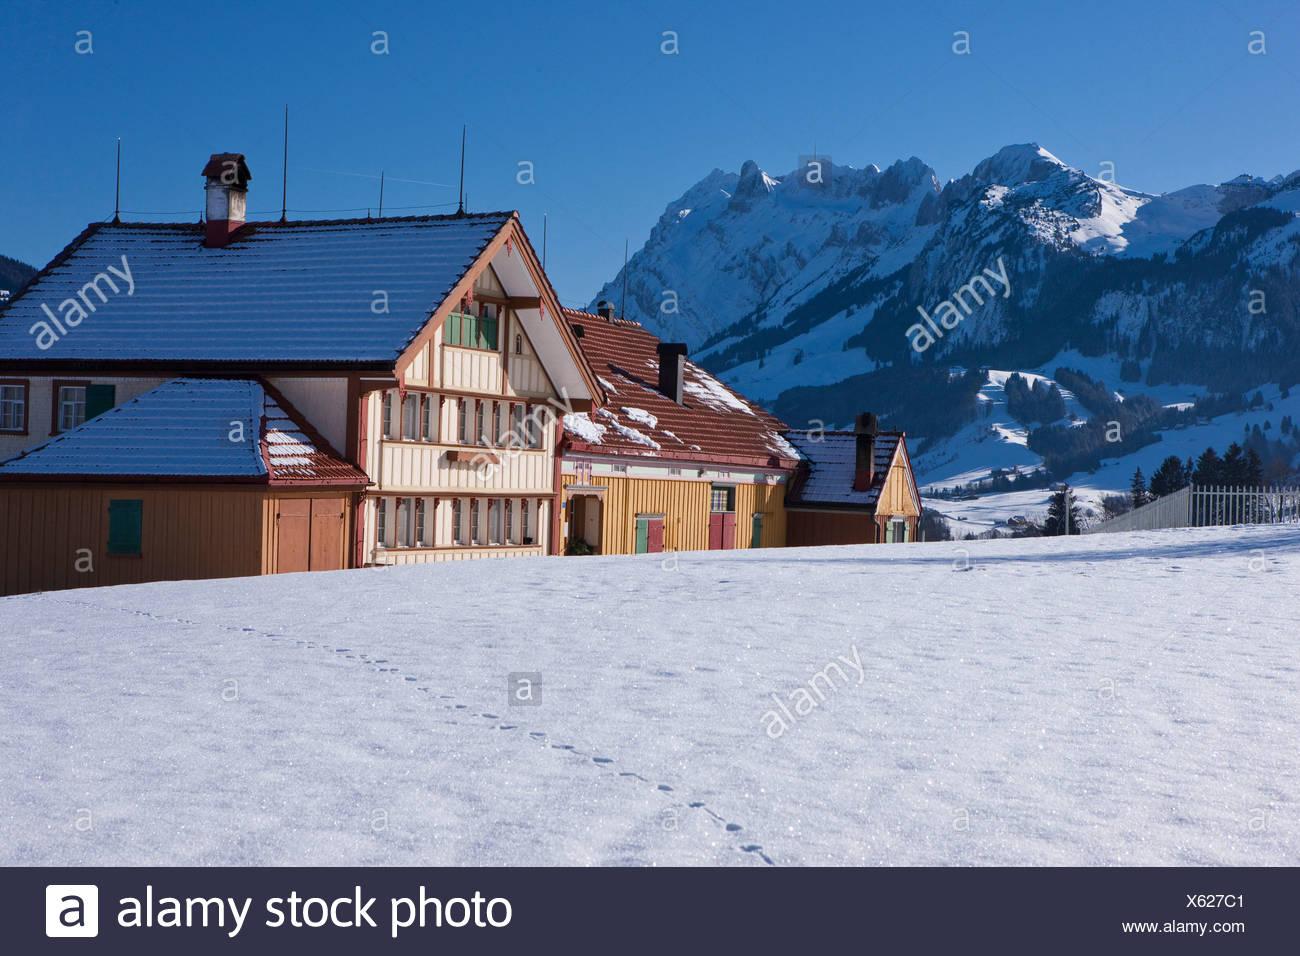 Farm, Säntis, winter, mountain, mountains, agriculture, canton, Appenzell, Innerroden, Appenzell area, Alpstein, Switzerland, Eu - Stock Image